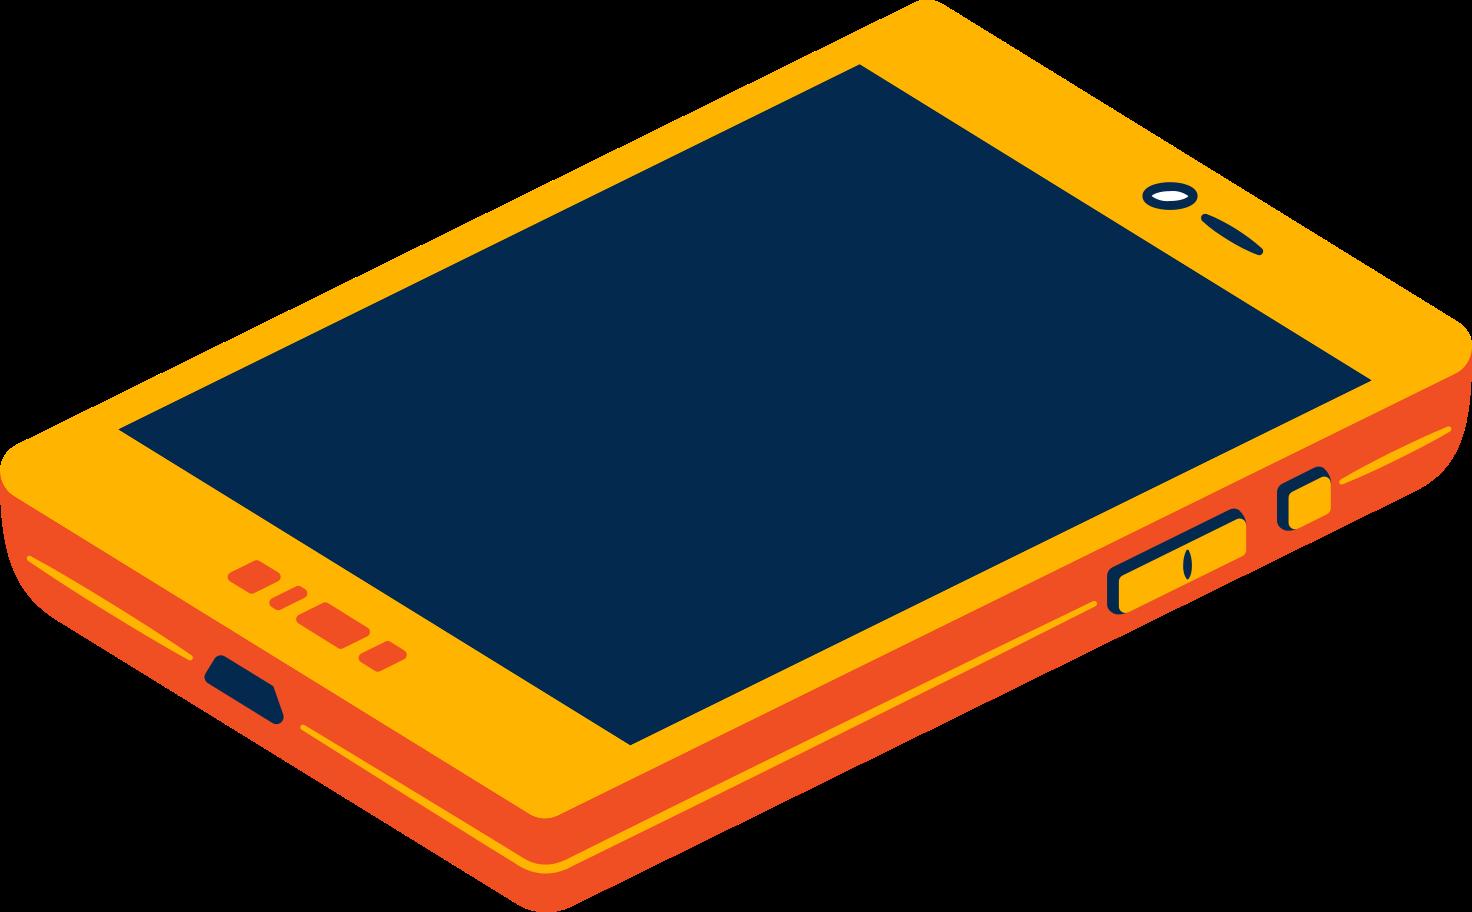 smartphone Clipart illustration in PNG, SVG